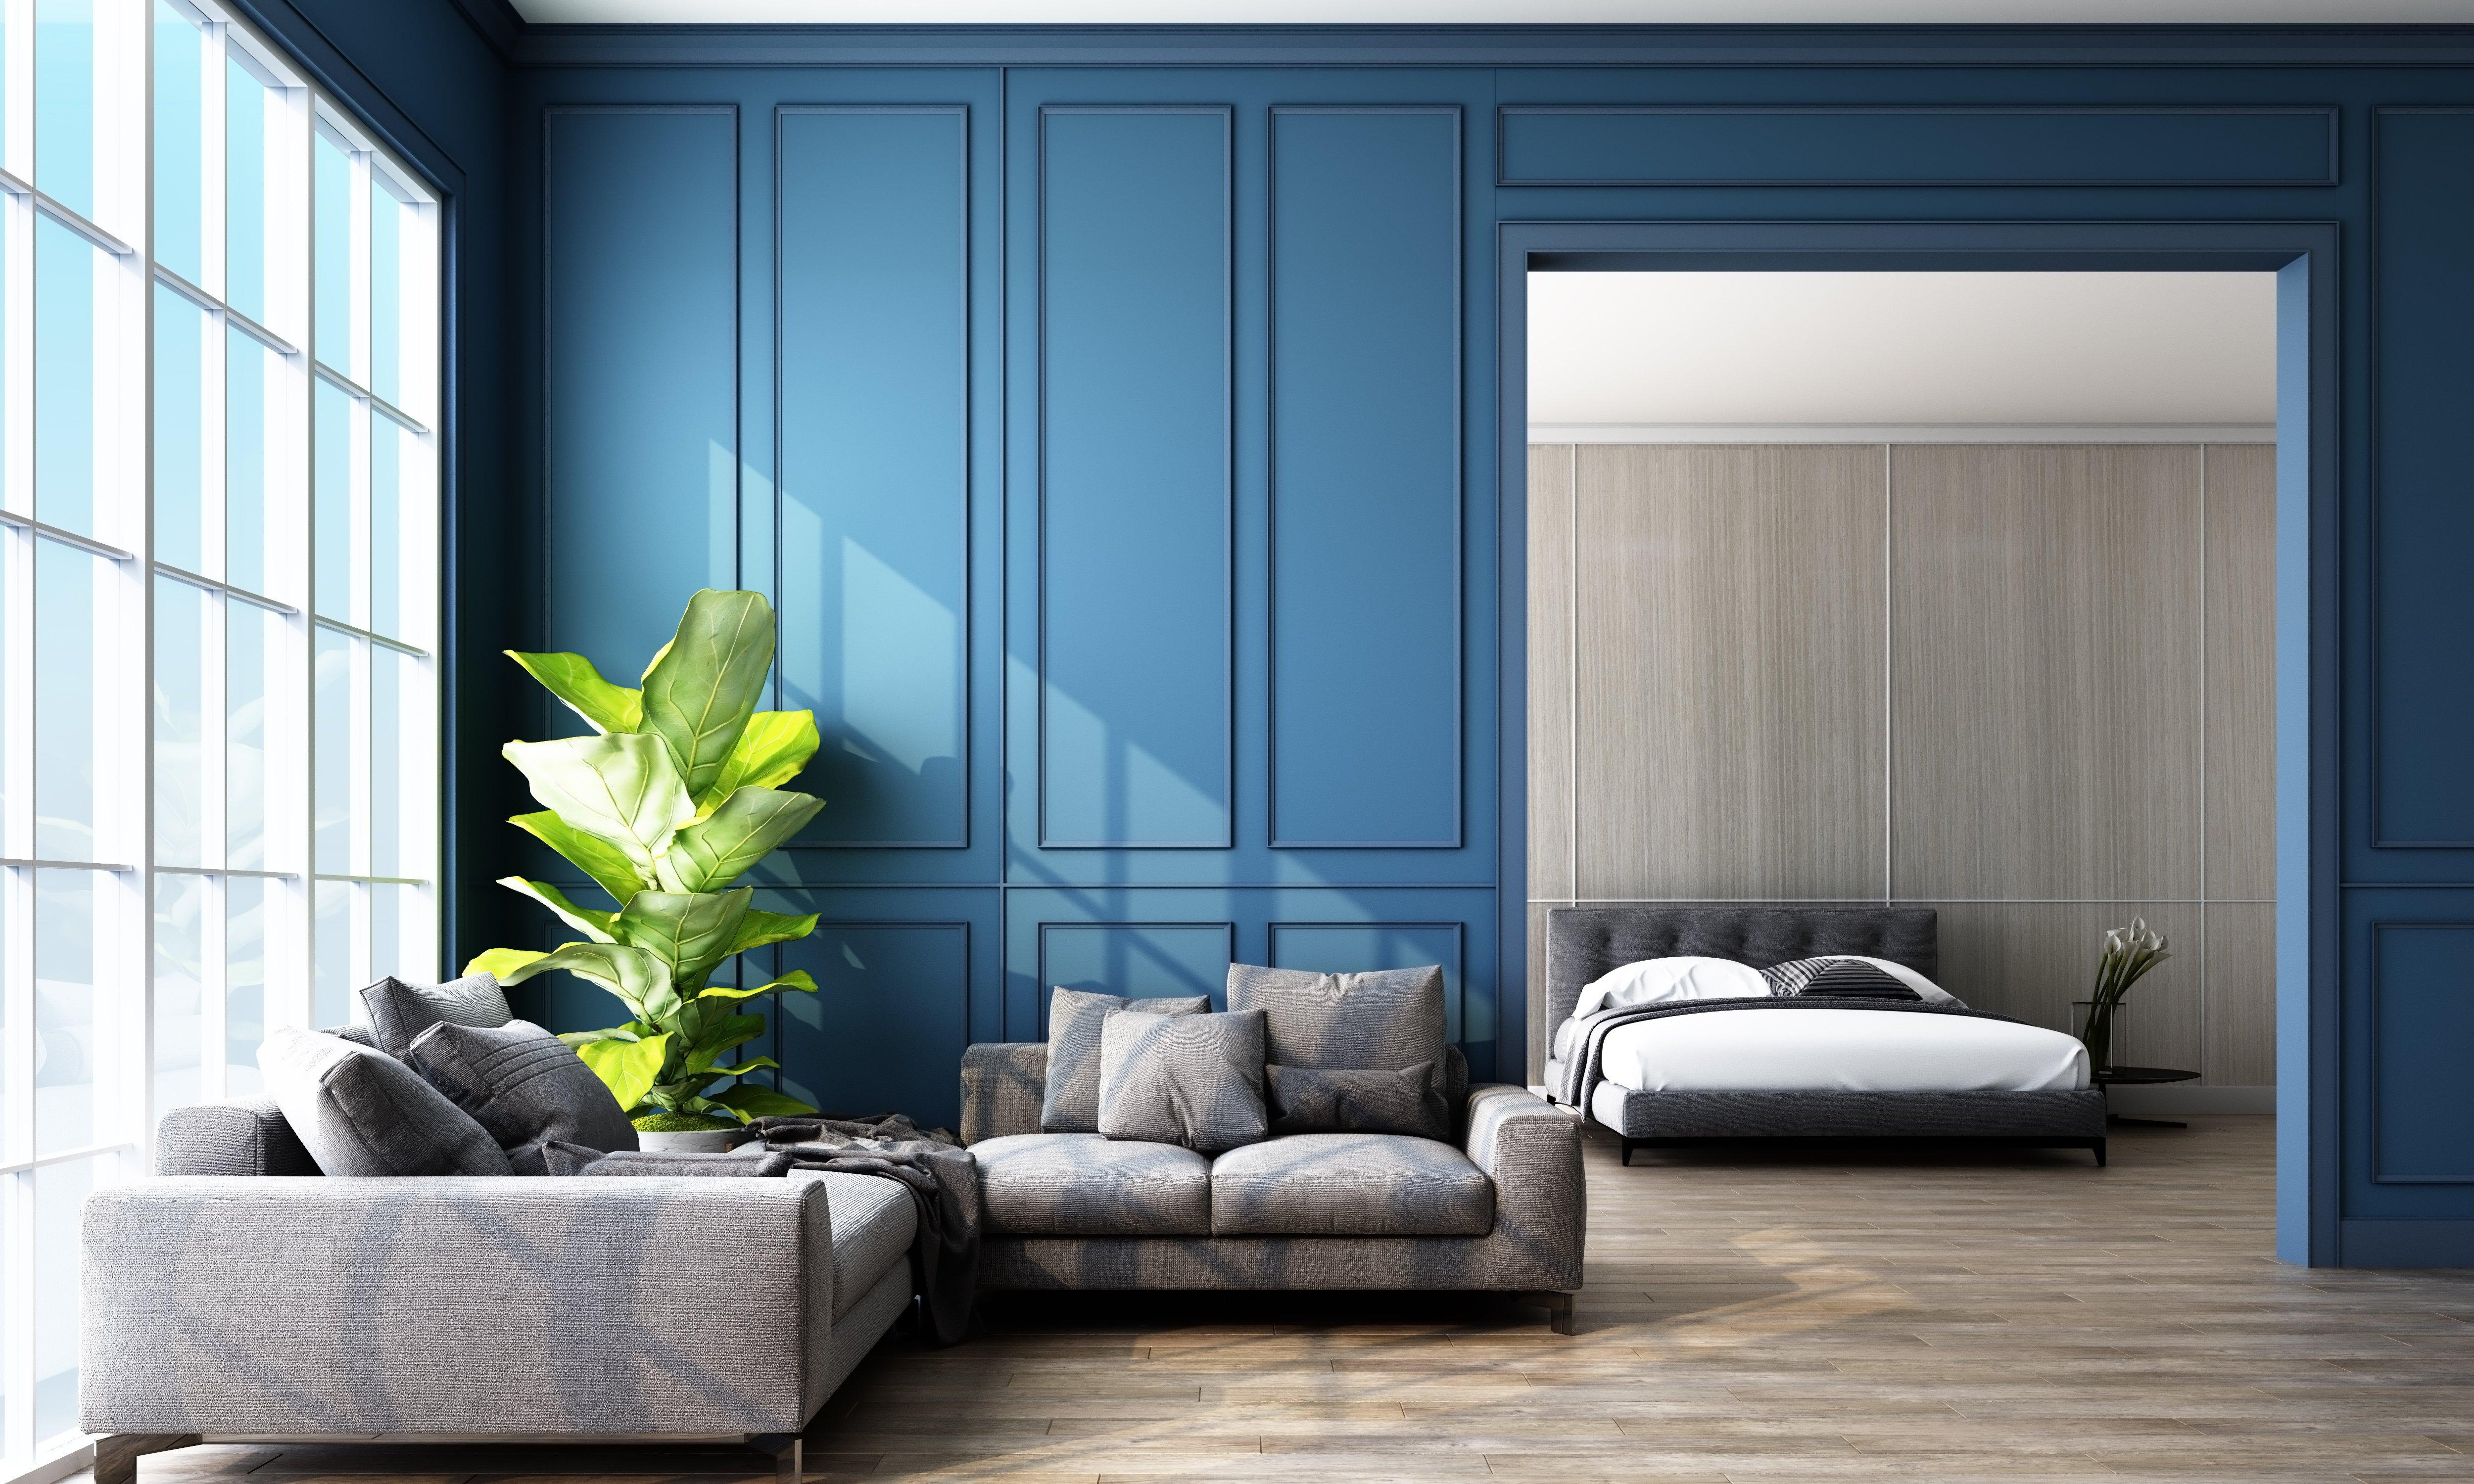 plyco-interior-wall-panel-7